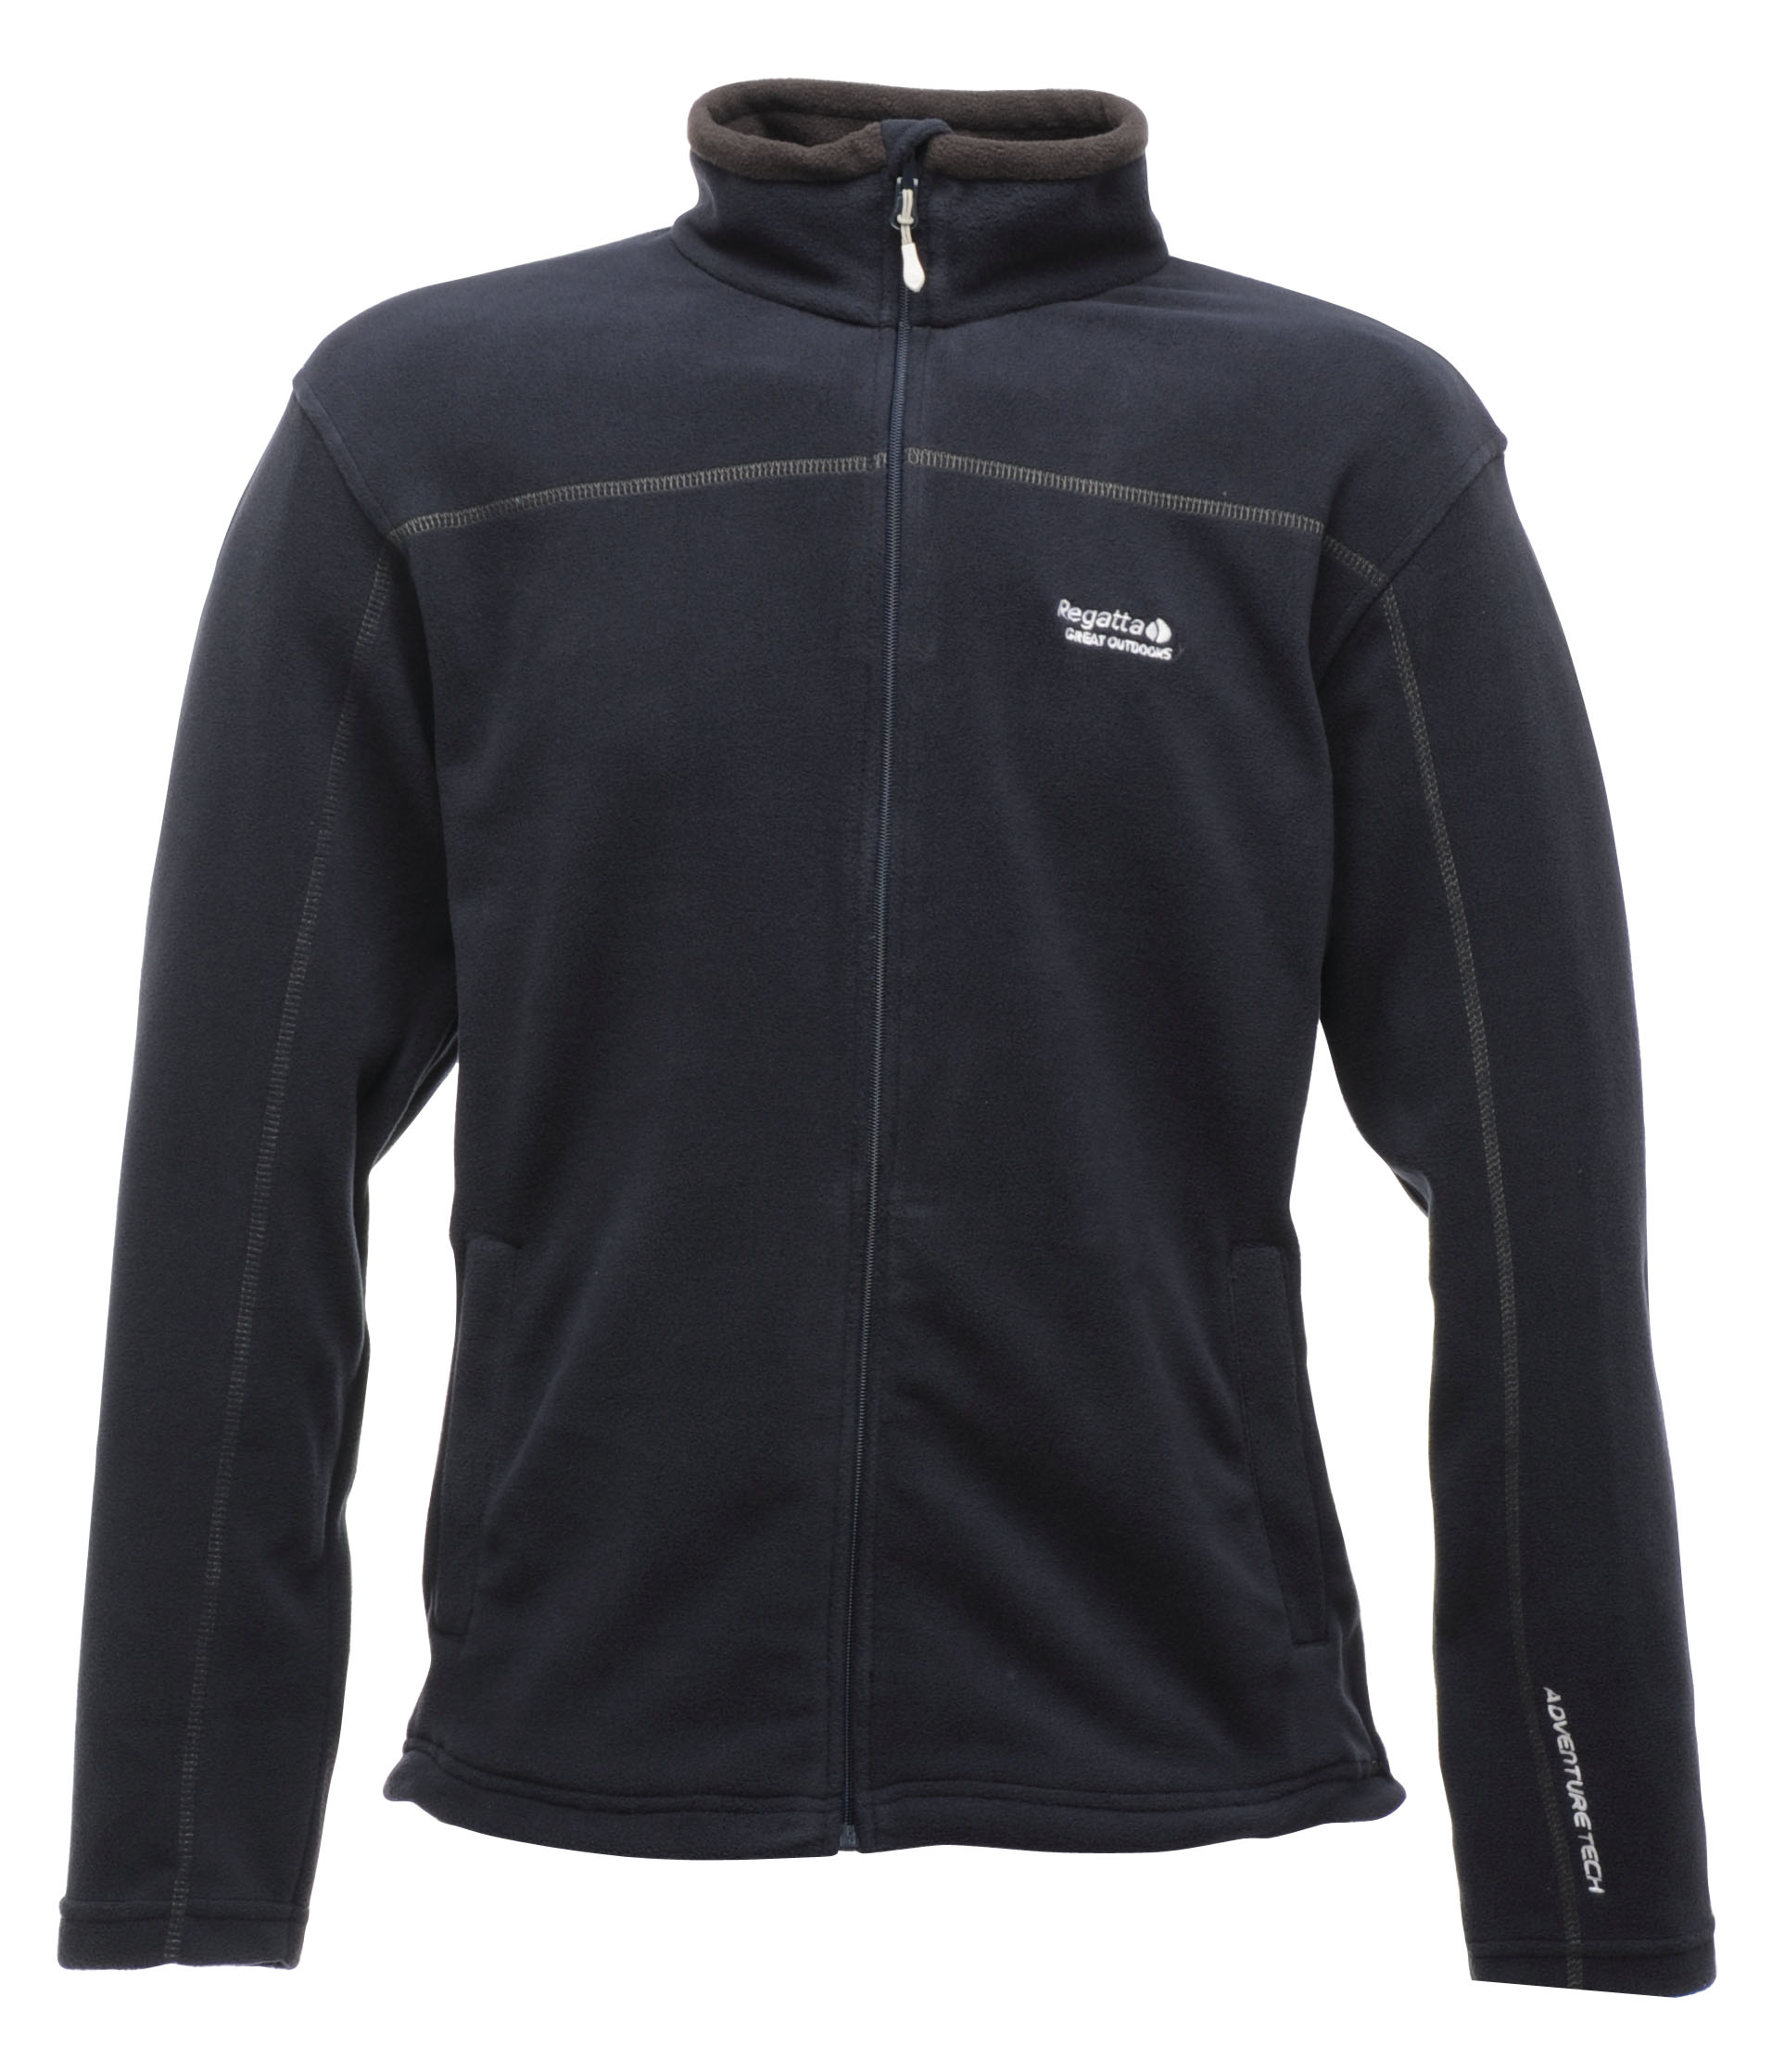 Regatta clothing store